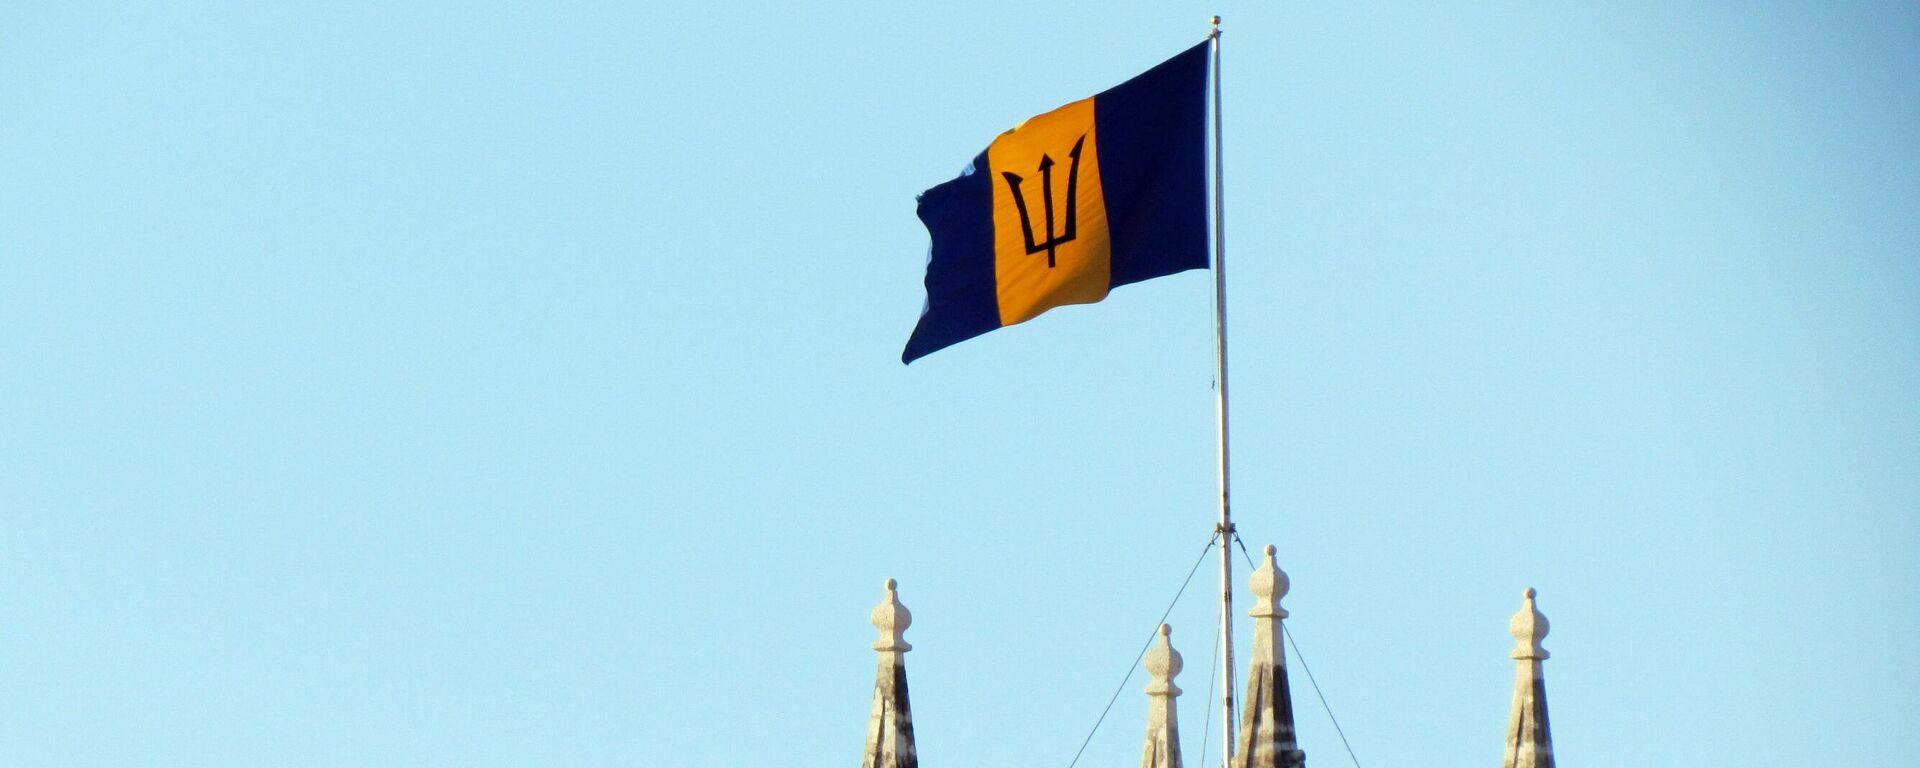 Bandera de Barbados  - Sputnik Mundo, 1920, 30.09.2021